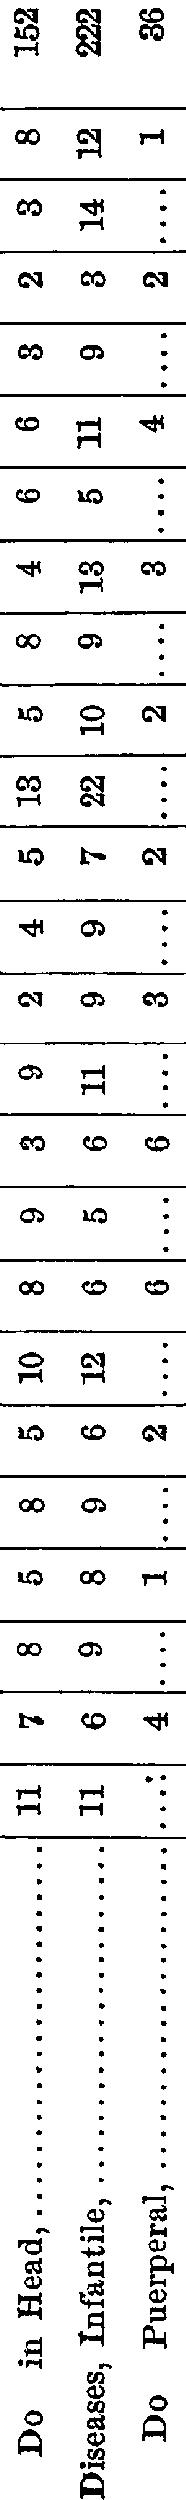 [merged small][merged small][merged small][merged small][merged small][merged small][merged small][merged small][merged small][merged small][merged small][merged small][merged small][merged small][merged small][merged small][merged small][merged small][merged small][merged small][merged small][merged small][merged small][merged small][merged small][ocr errors][merged small][merged small][merged small][merged small][merged small][merged small][merged small][merged small][merged small][merged small][merged small][merged small][merged small][merged small][merged small][merged small][merged small][merged small][merged small][merged small][merged small][merged small][merged small][merged small][merged small][merged small][merged small][merged small][merged small][merged small][merged small][merged small][merged small][merged small][merged small][merged small][merged small]